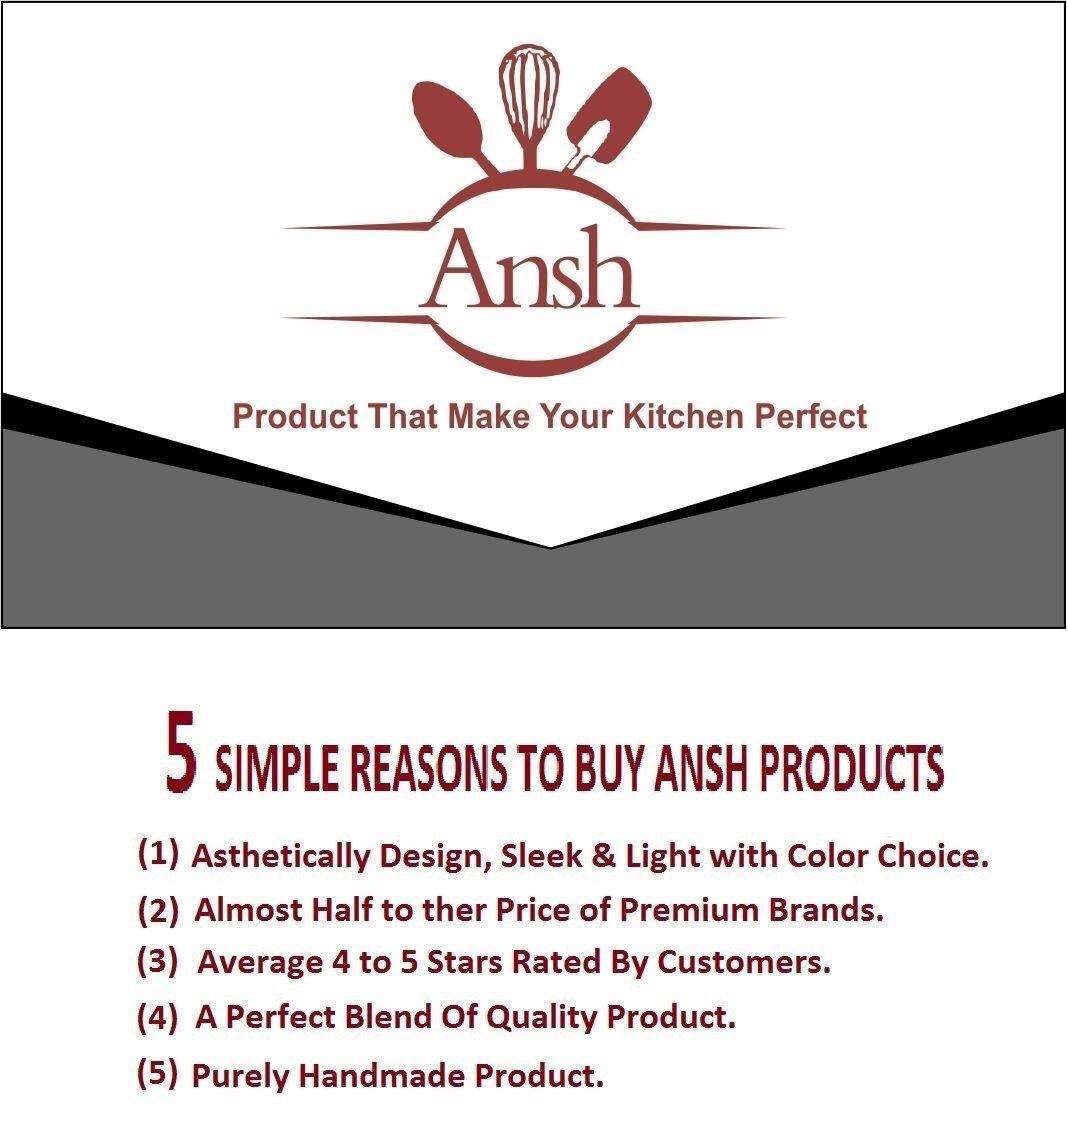 Ansh Handmade Teak Wood Kitchen Masher by Ansh (Image #3)